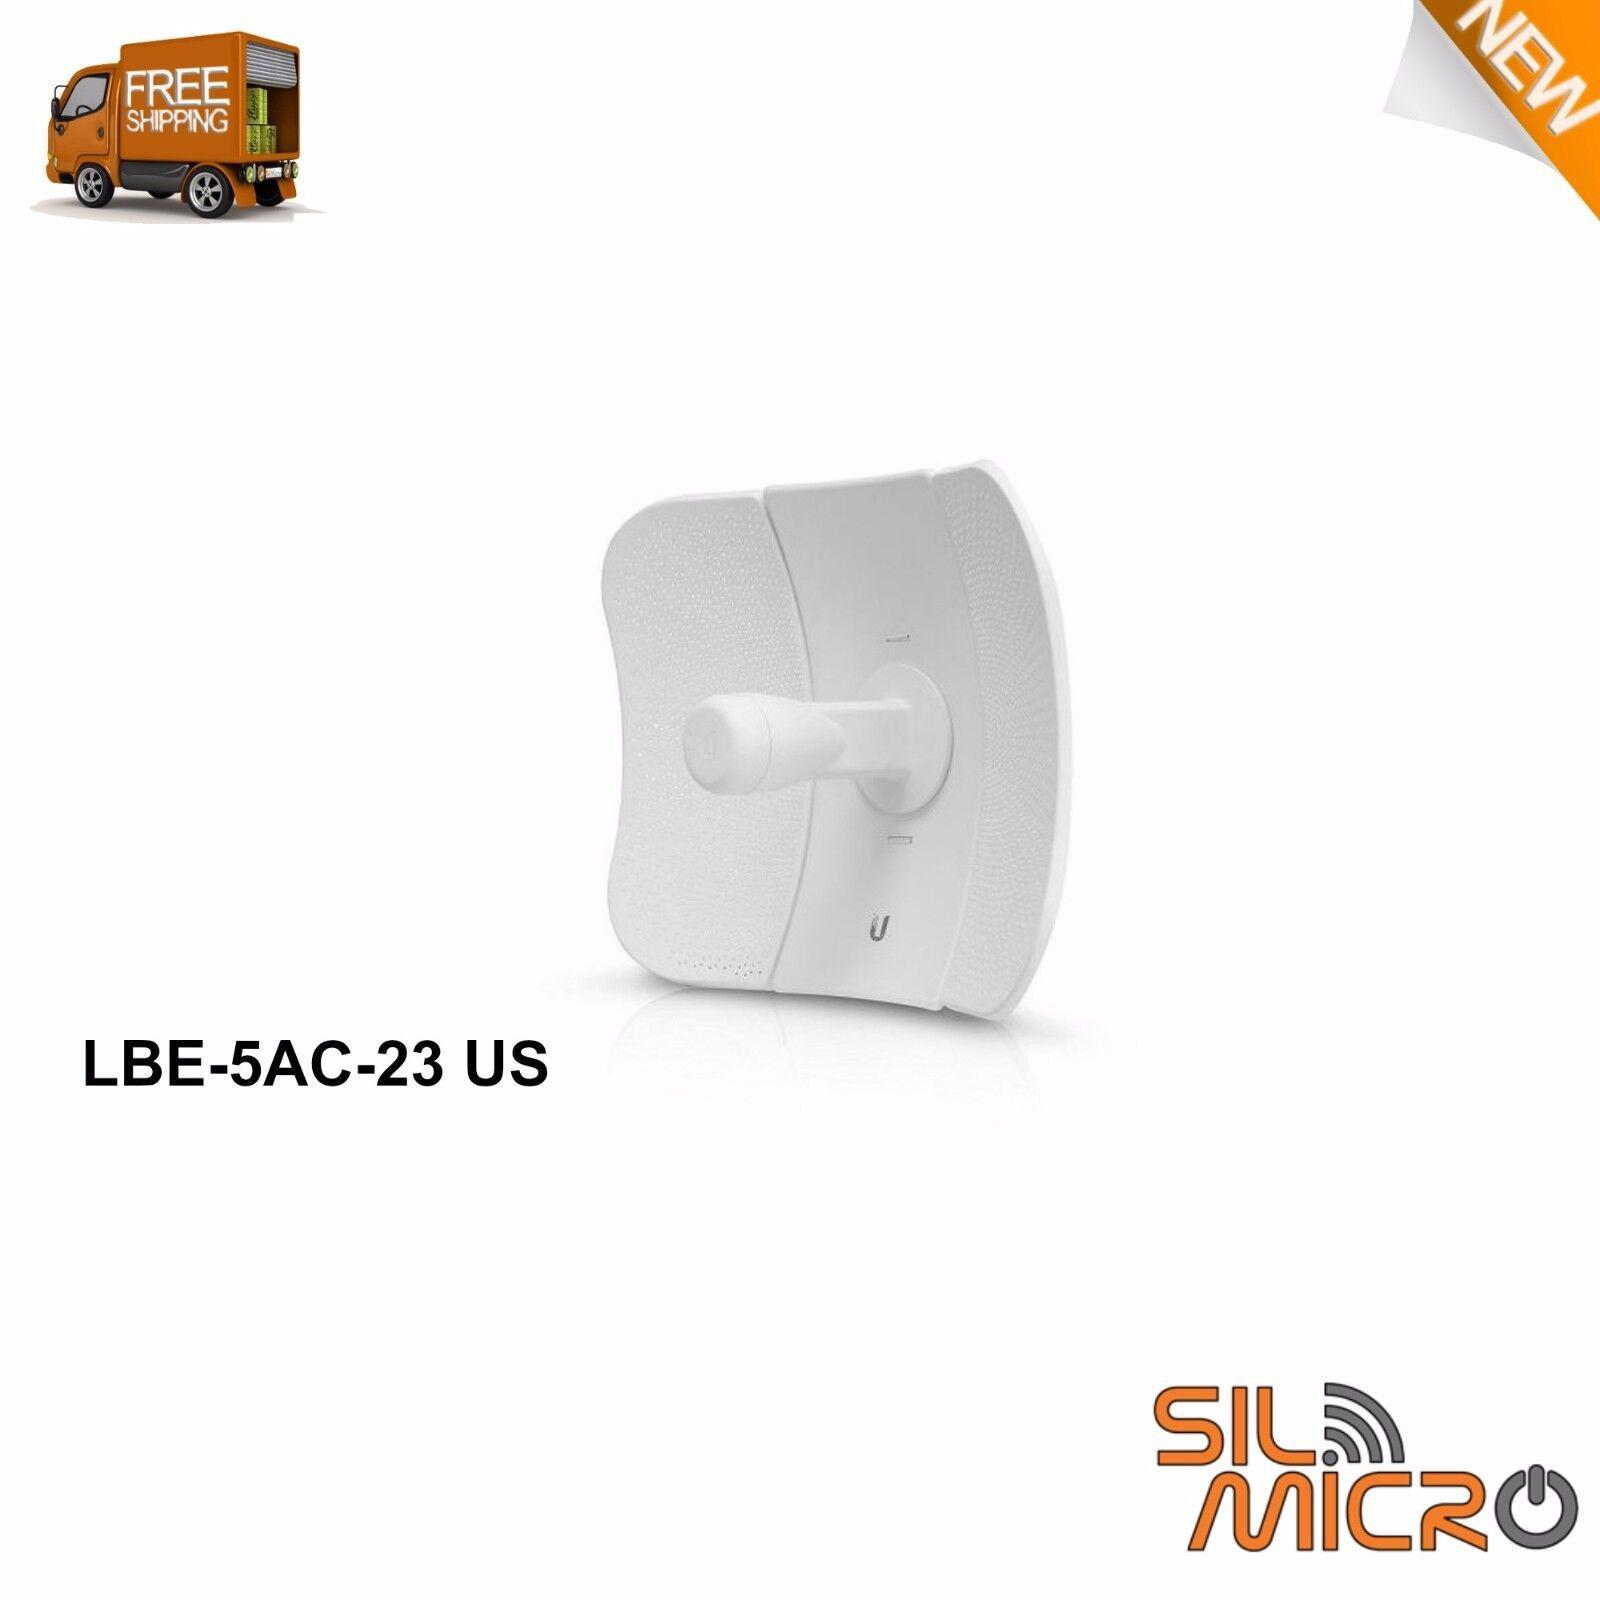 Ubiquiti Litebeam Compare Prices At Nextag M5 23dbi Lbe 5ac 23 Us 5ghz Airmax Cpe G